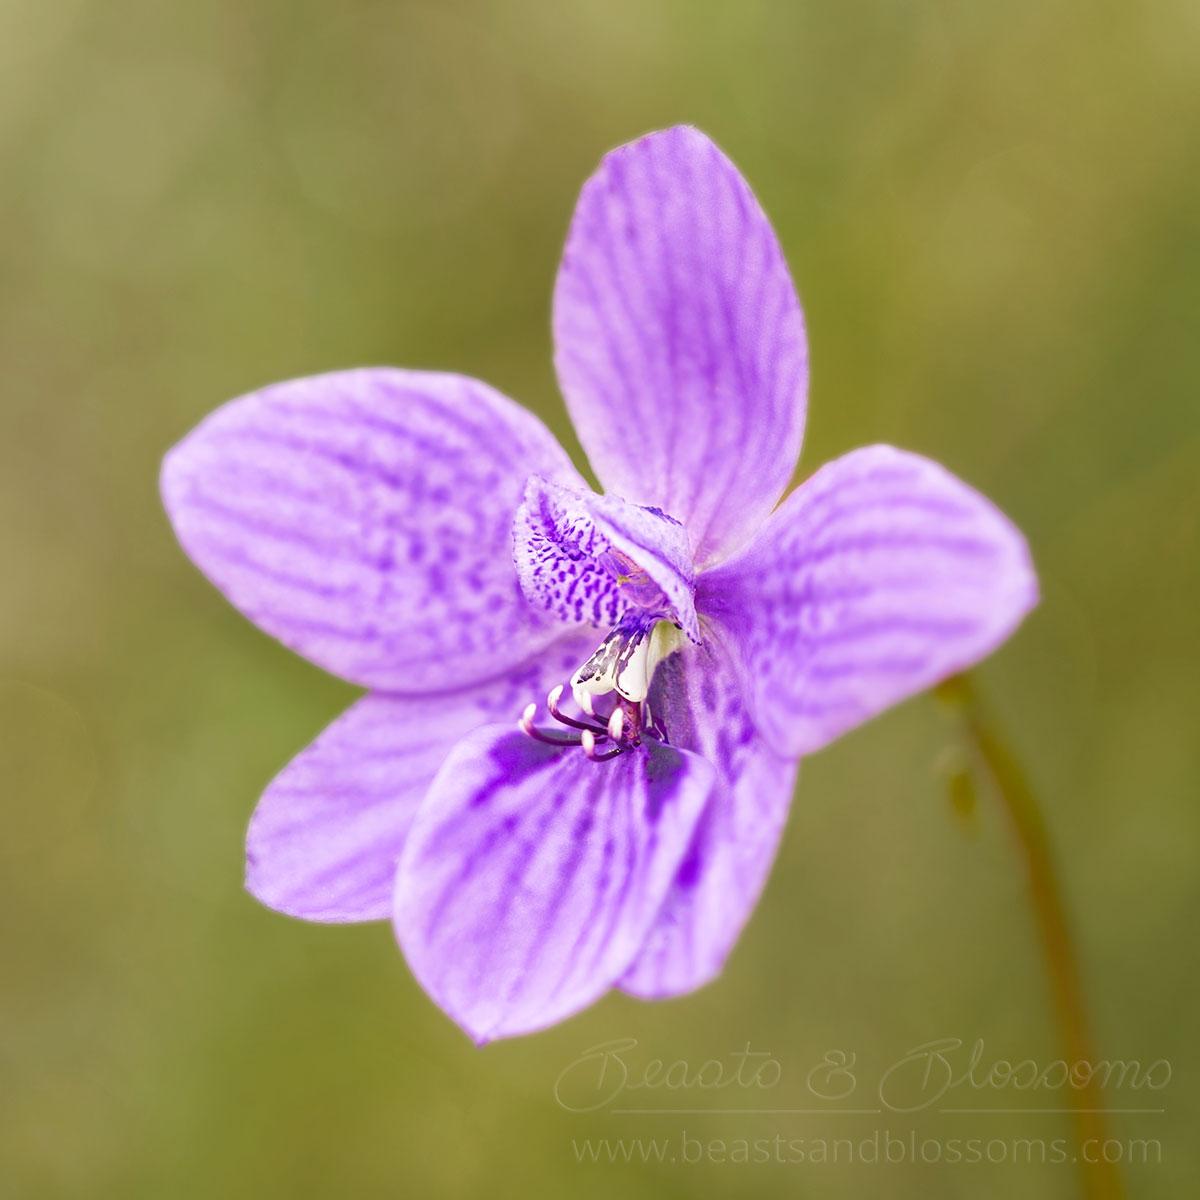 South west WA wildflower: babe-in-a-cradle orchid (Epiblema grandiflorum)